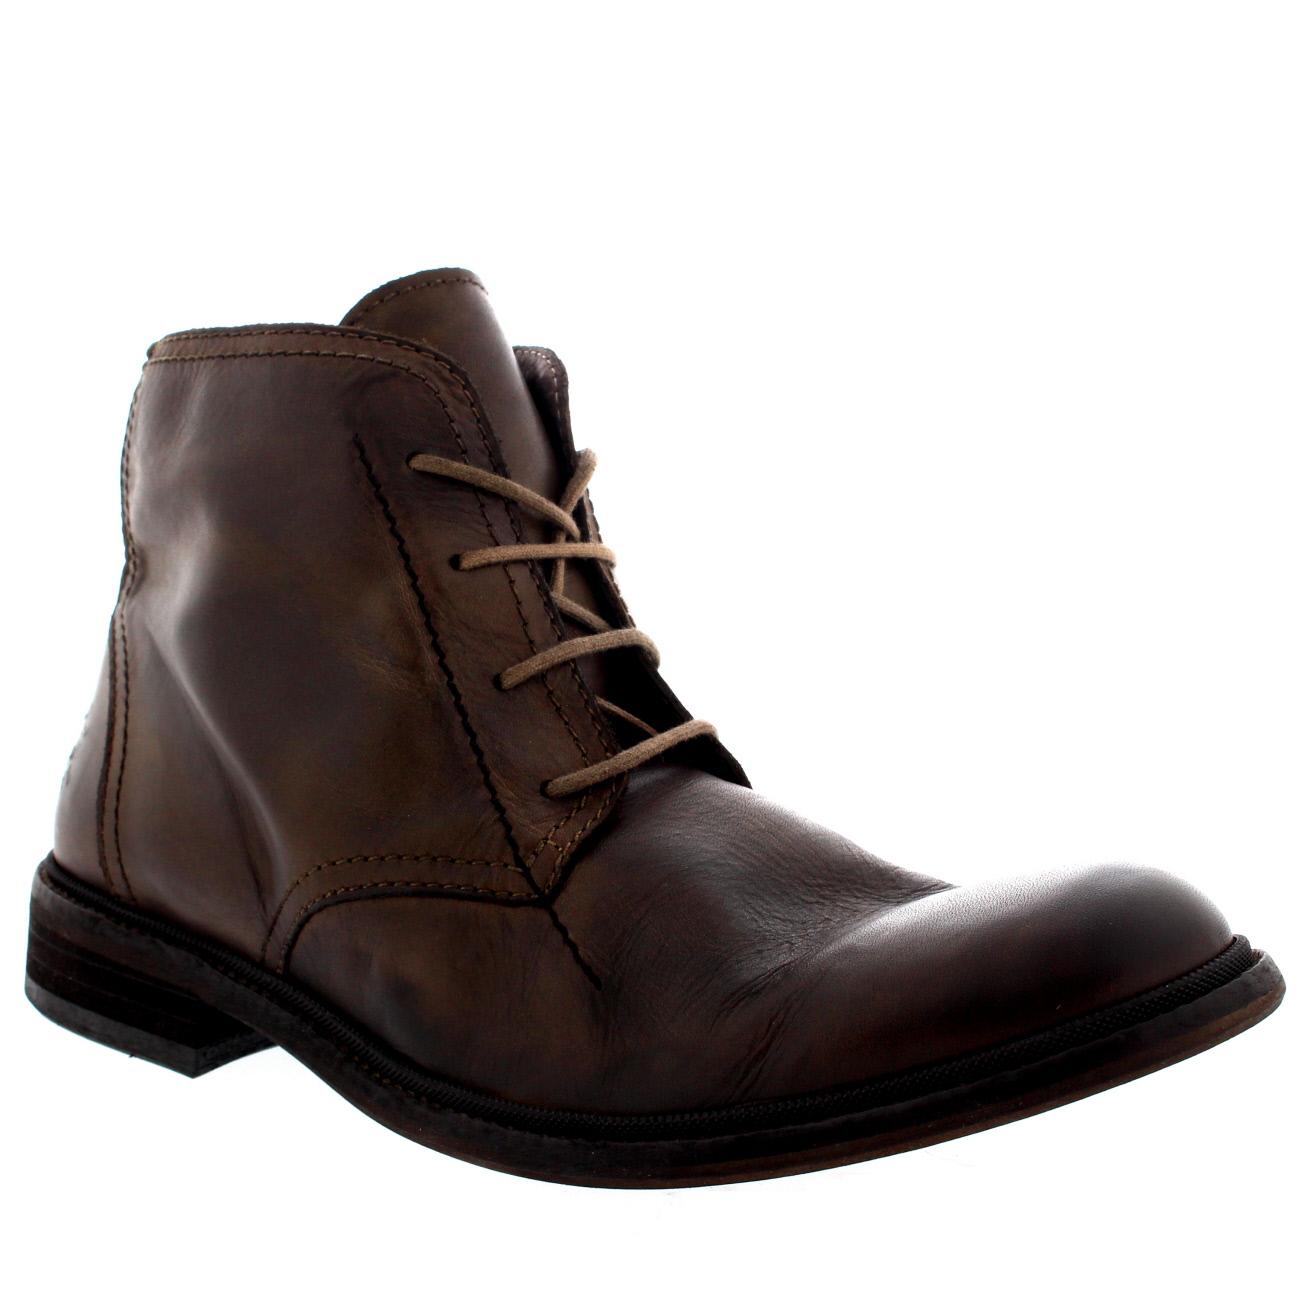 Chukka Style Mens Shoes